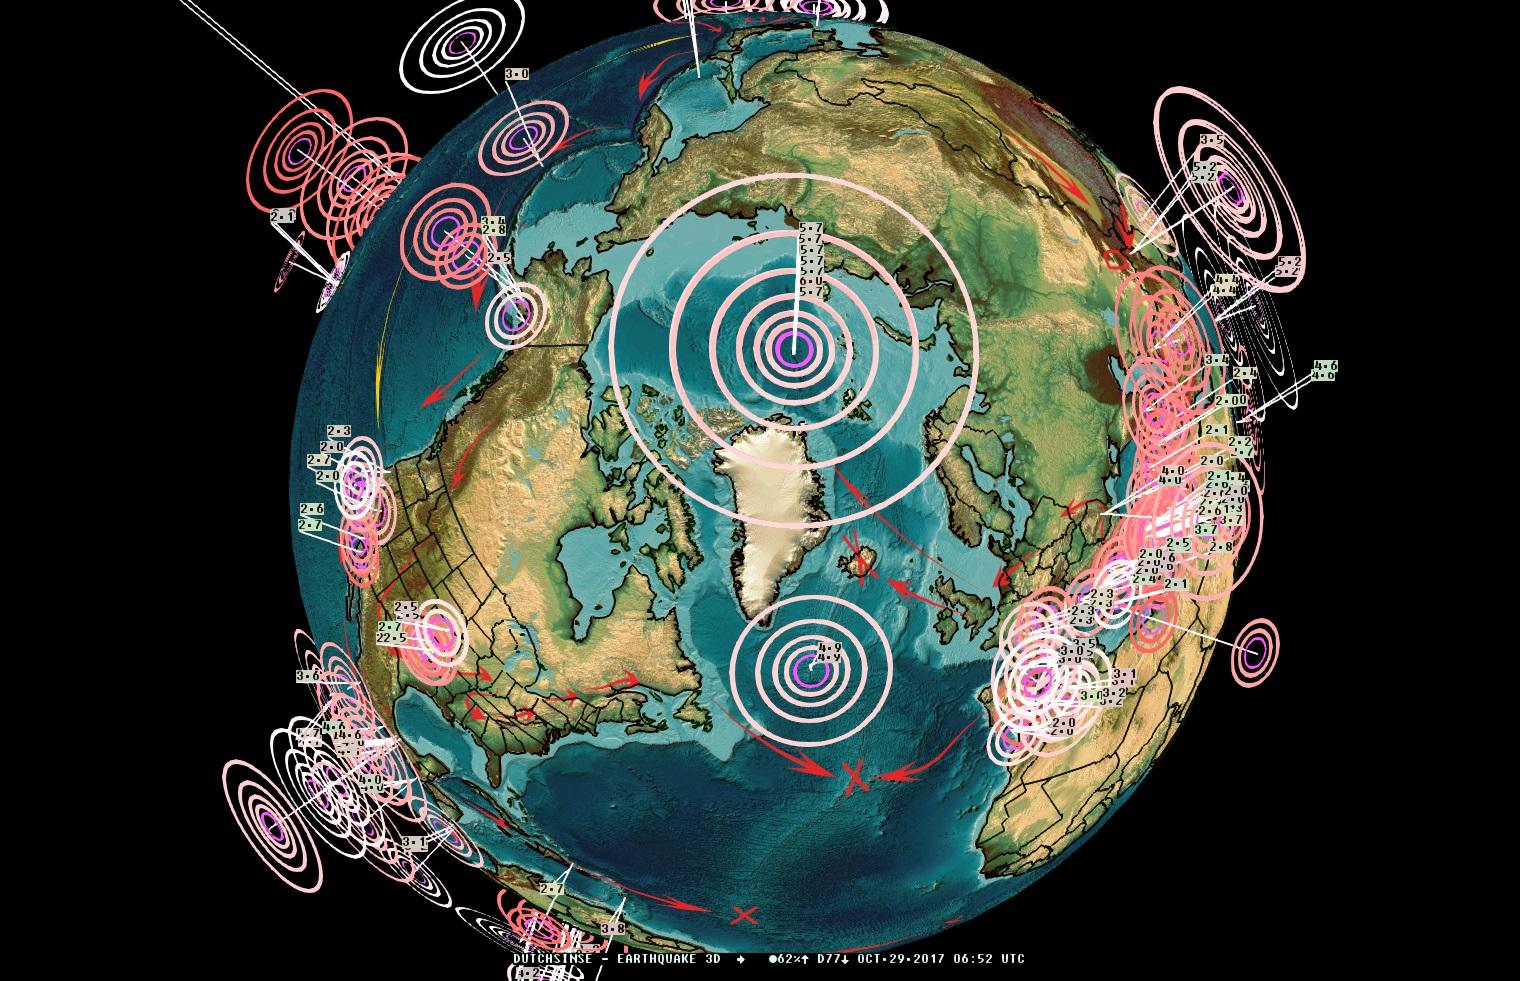 north-pole-earthquake-and-deep-earthquake-event-oct-29-2017a